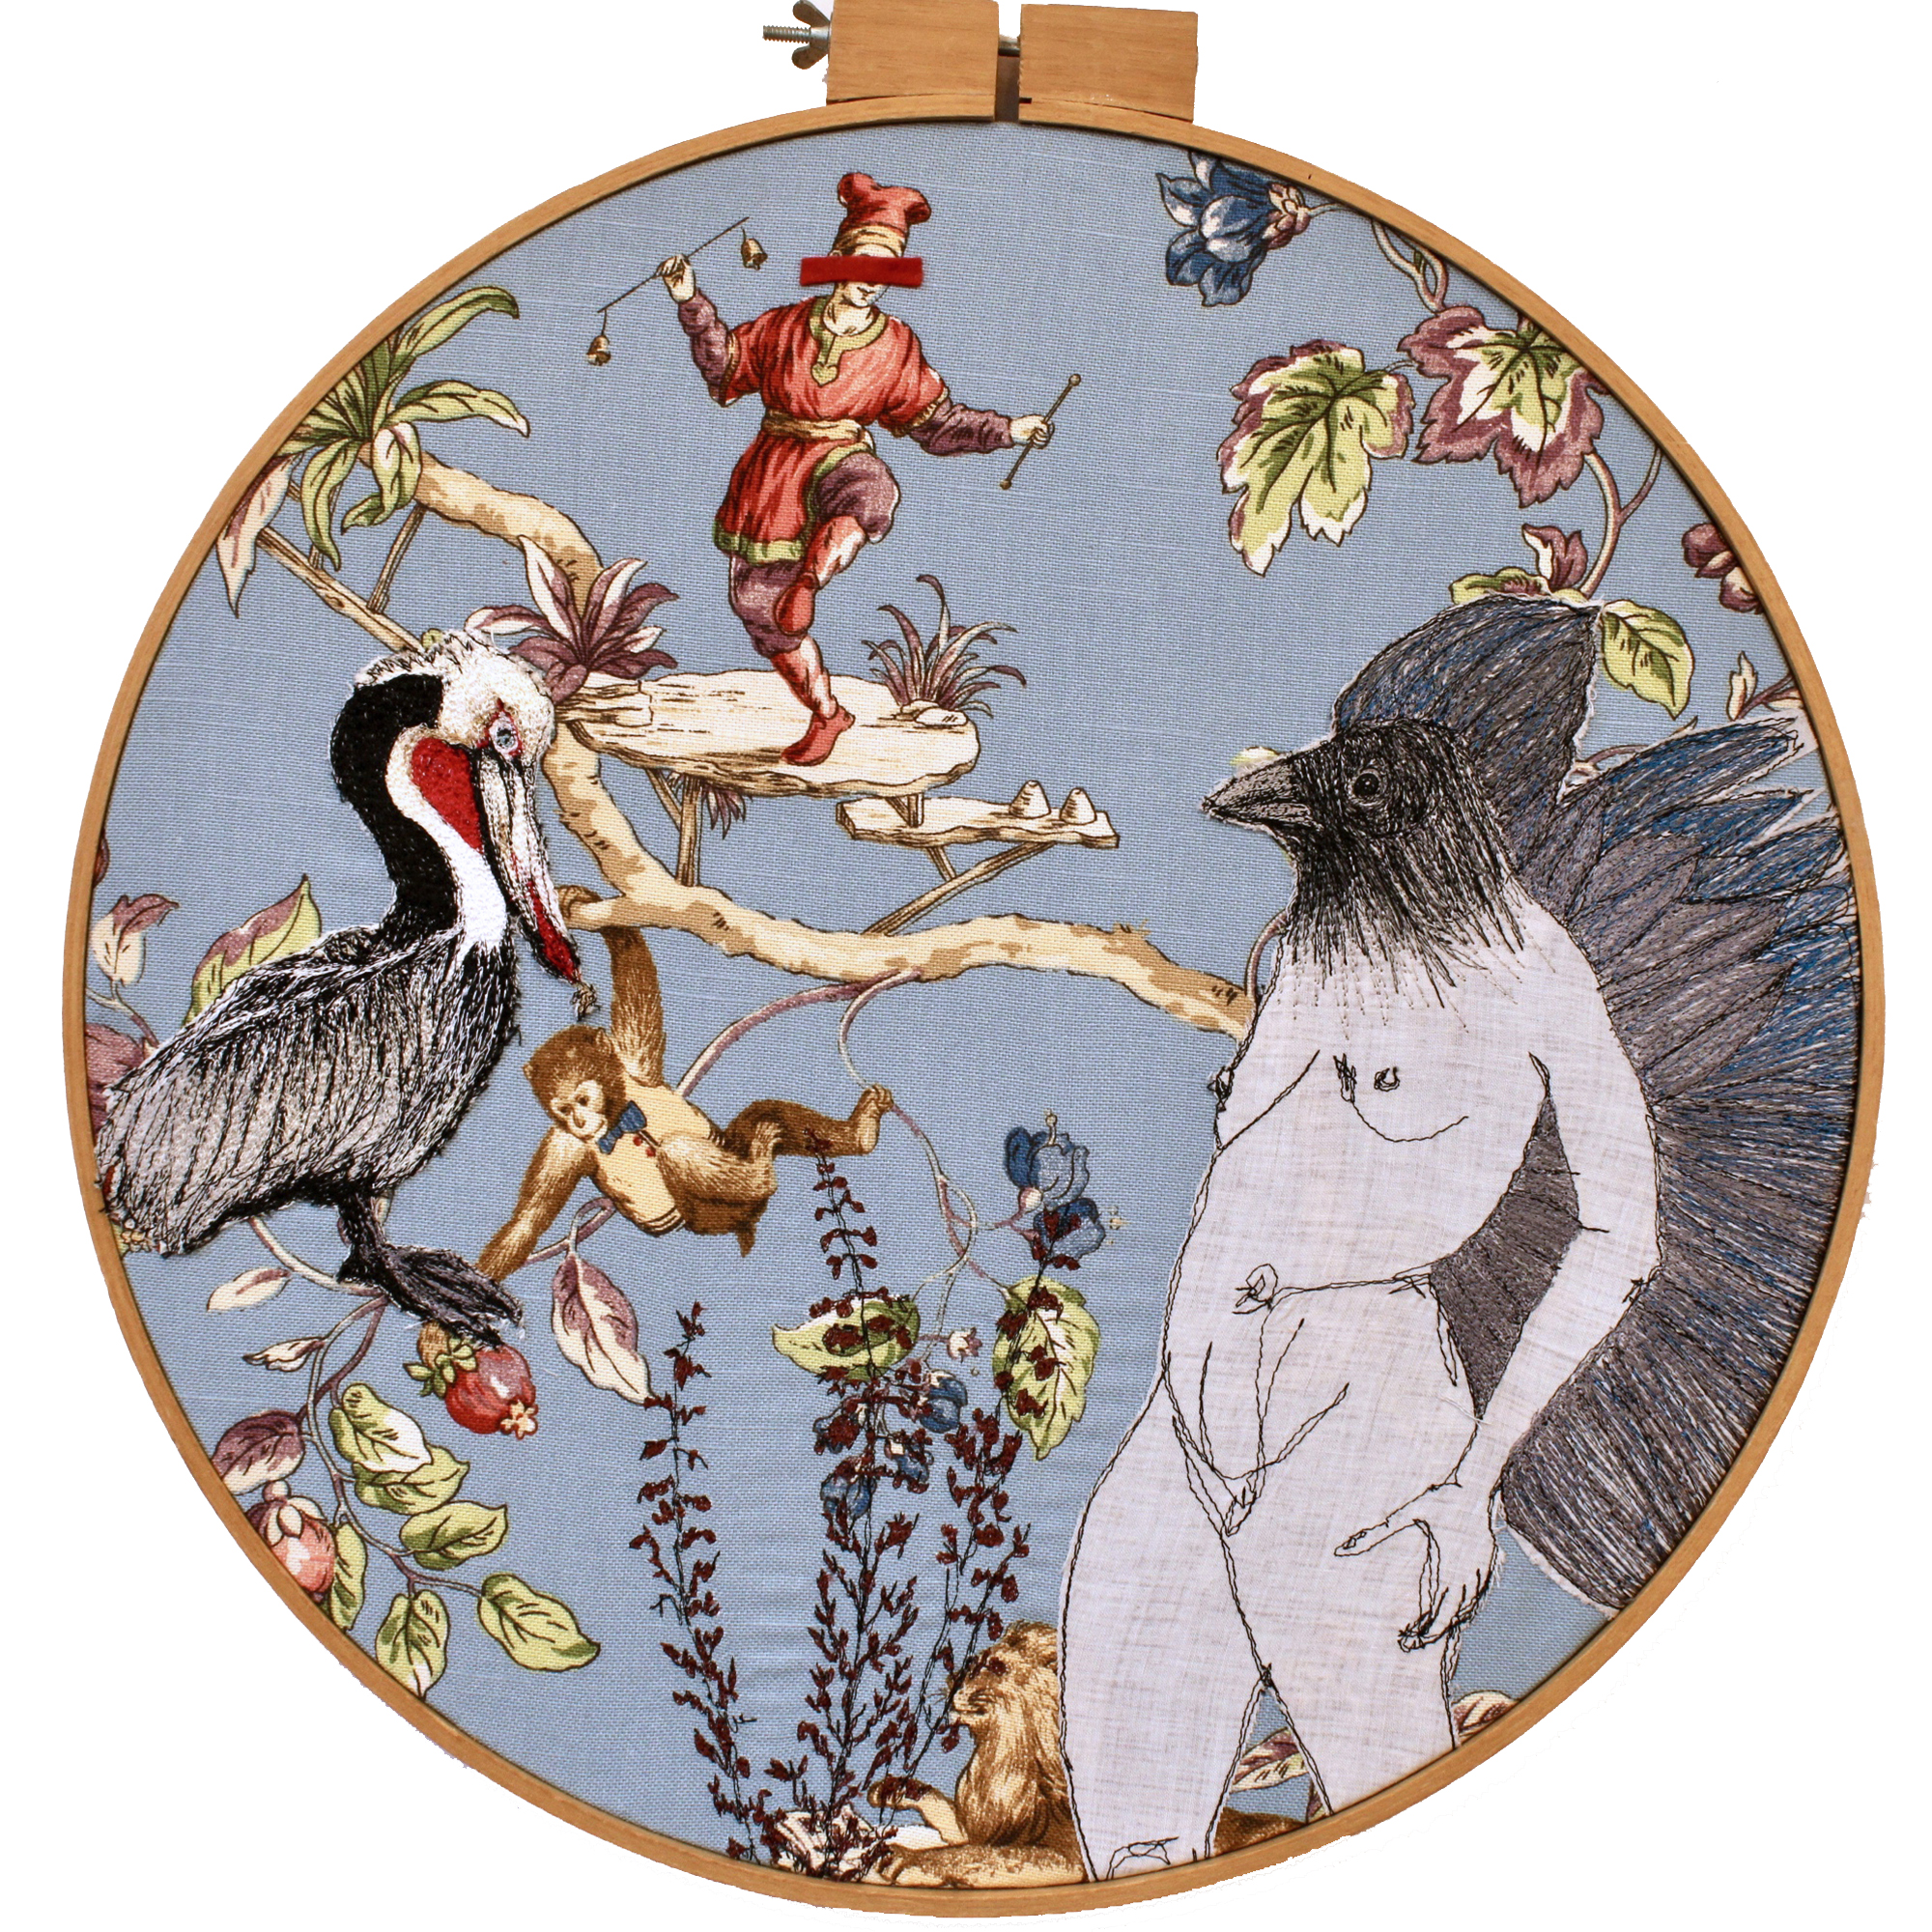 fiber art, bird women, Freehand machine stitch, thread drawing. thread painting